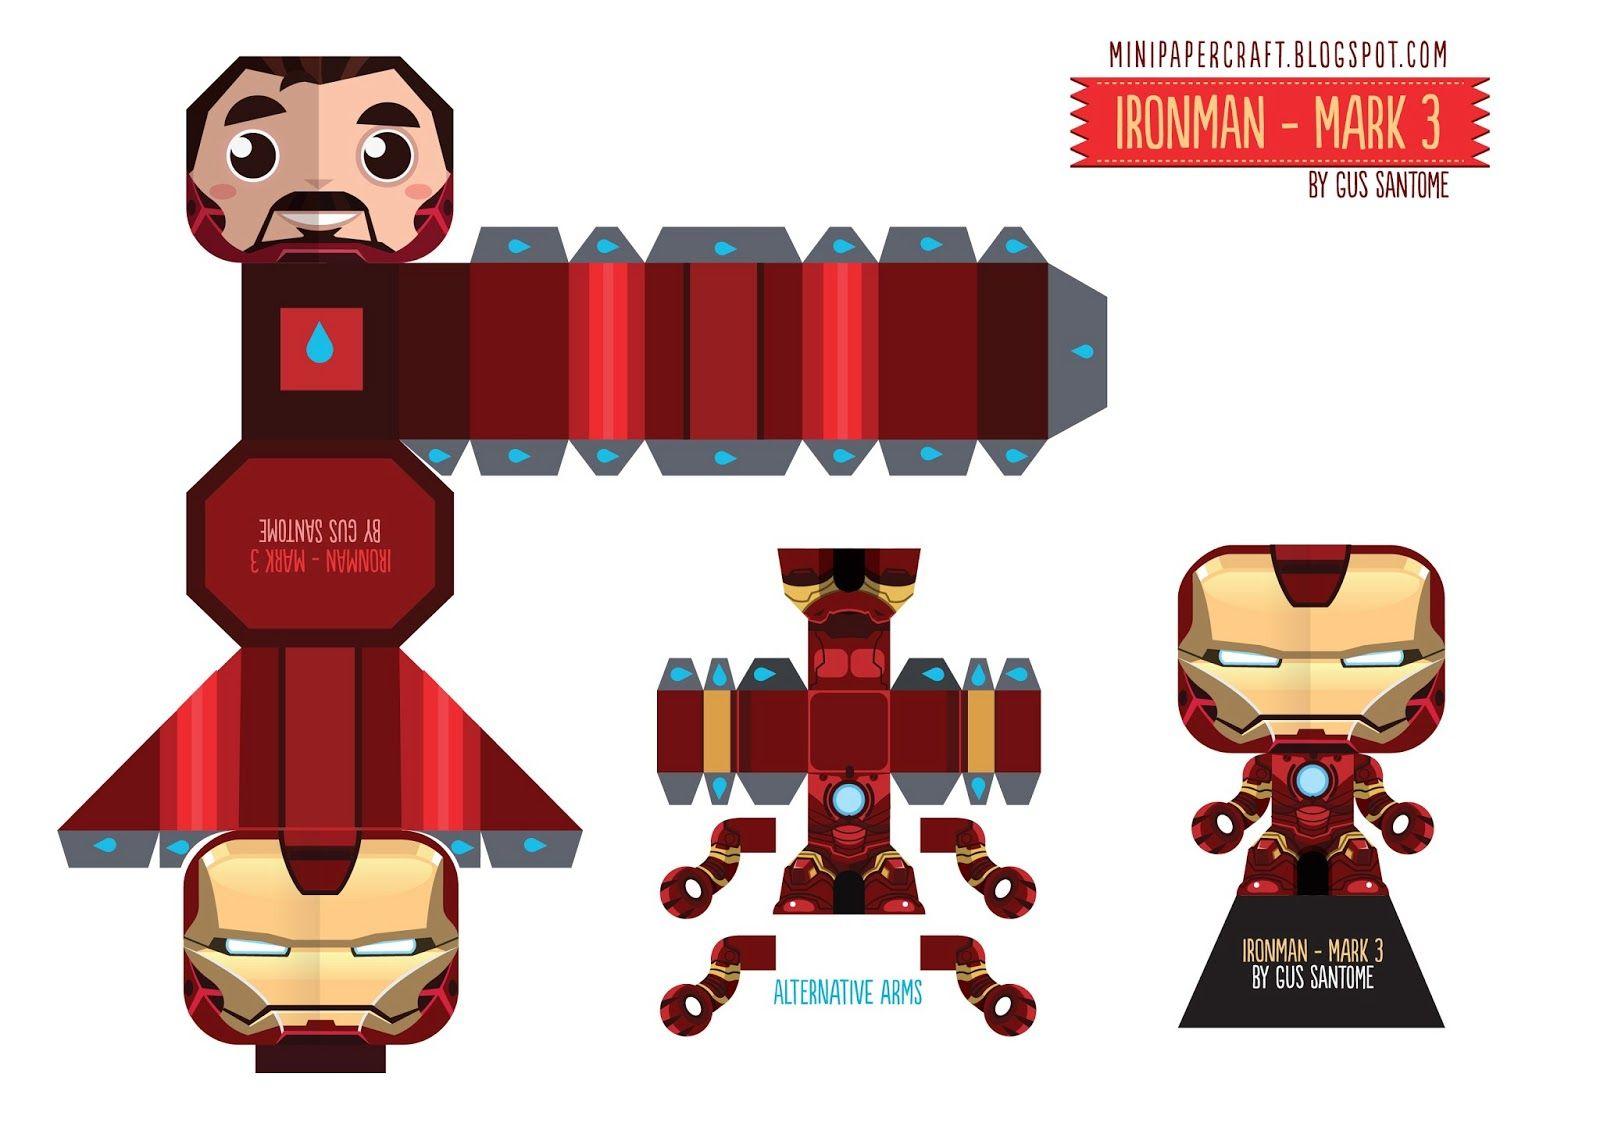 Mini Papercraft  Superheroes Plegado De Papel 0c54e84a0f9